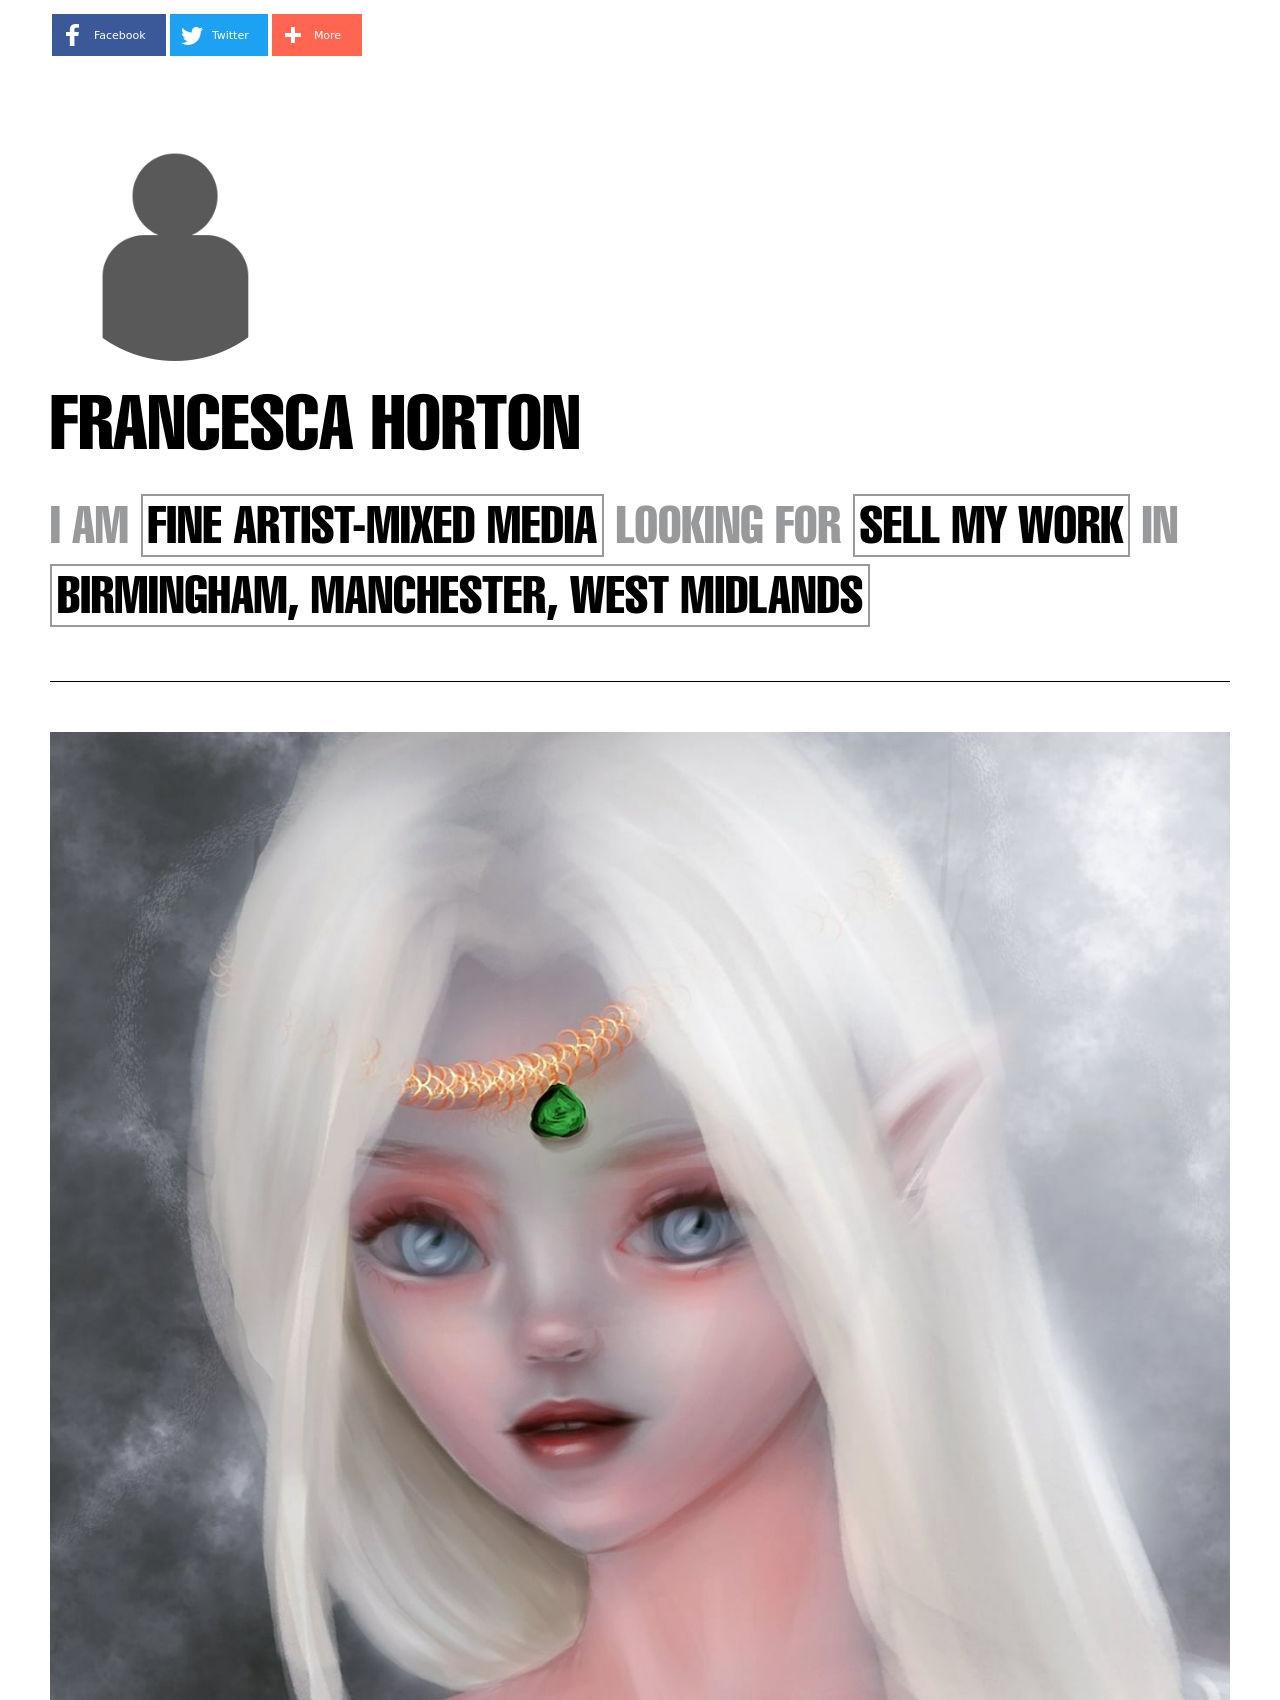 Francesca Horton